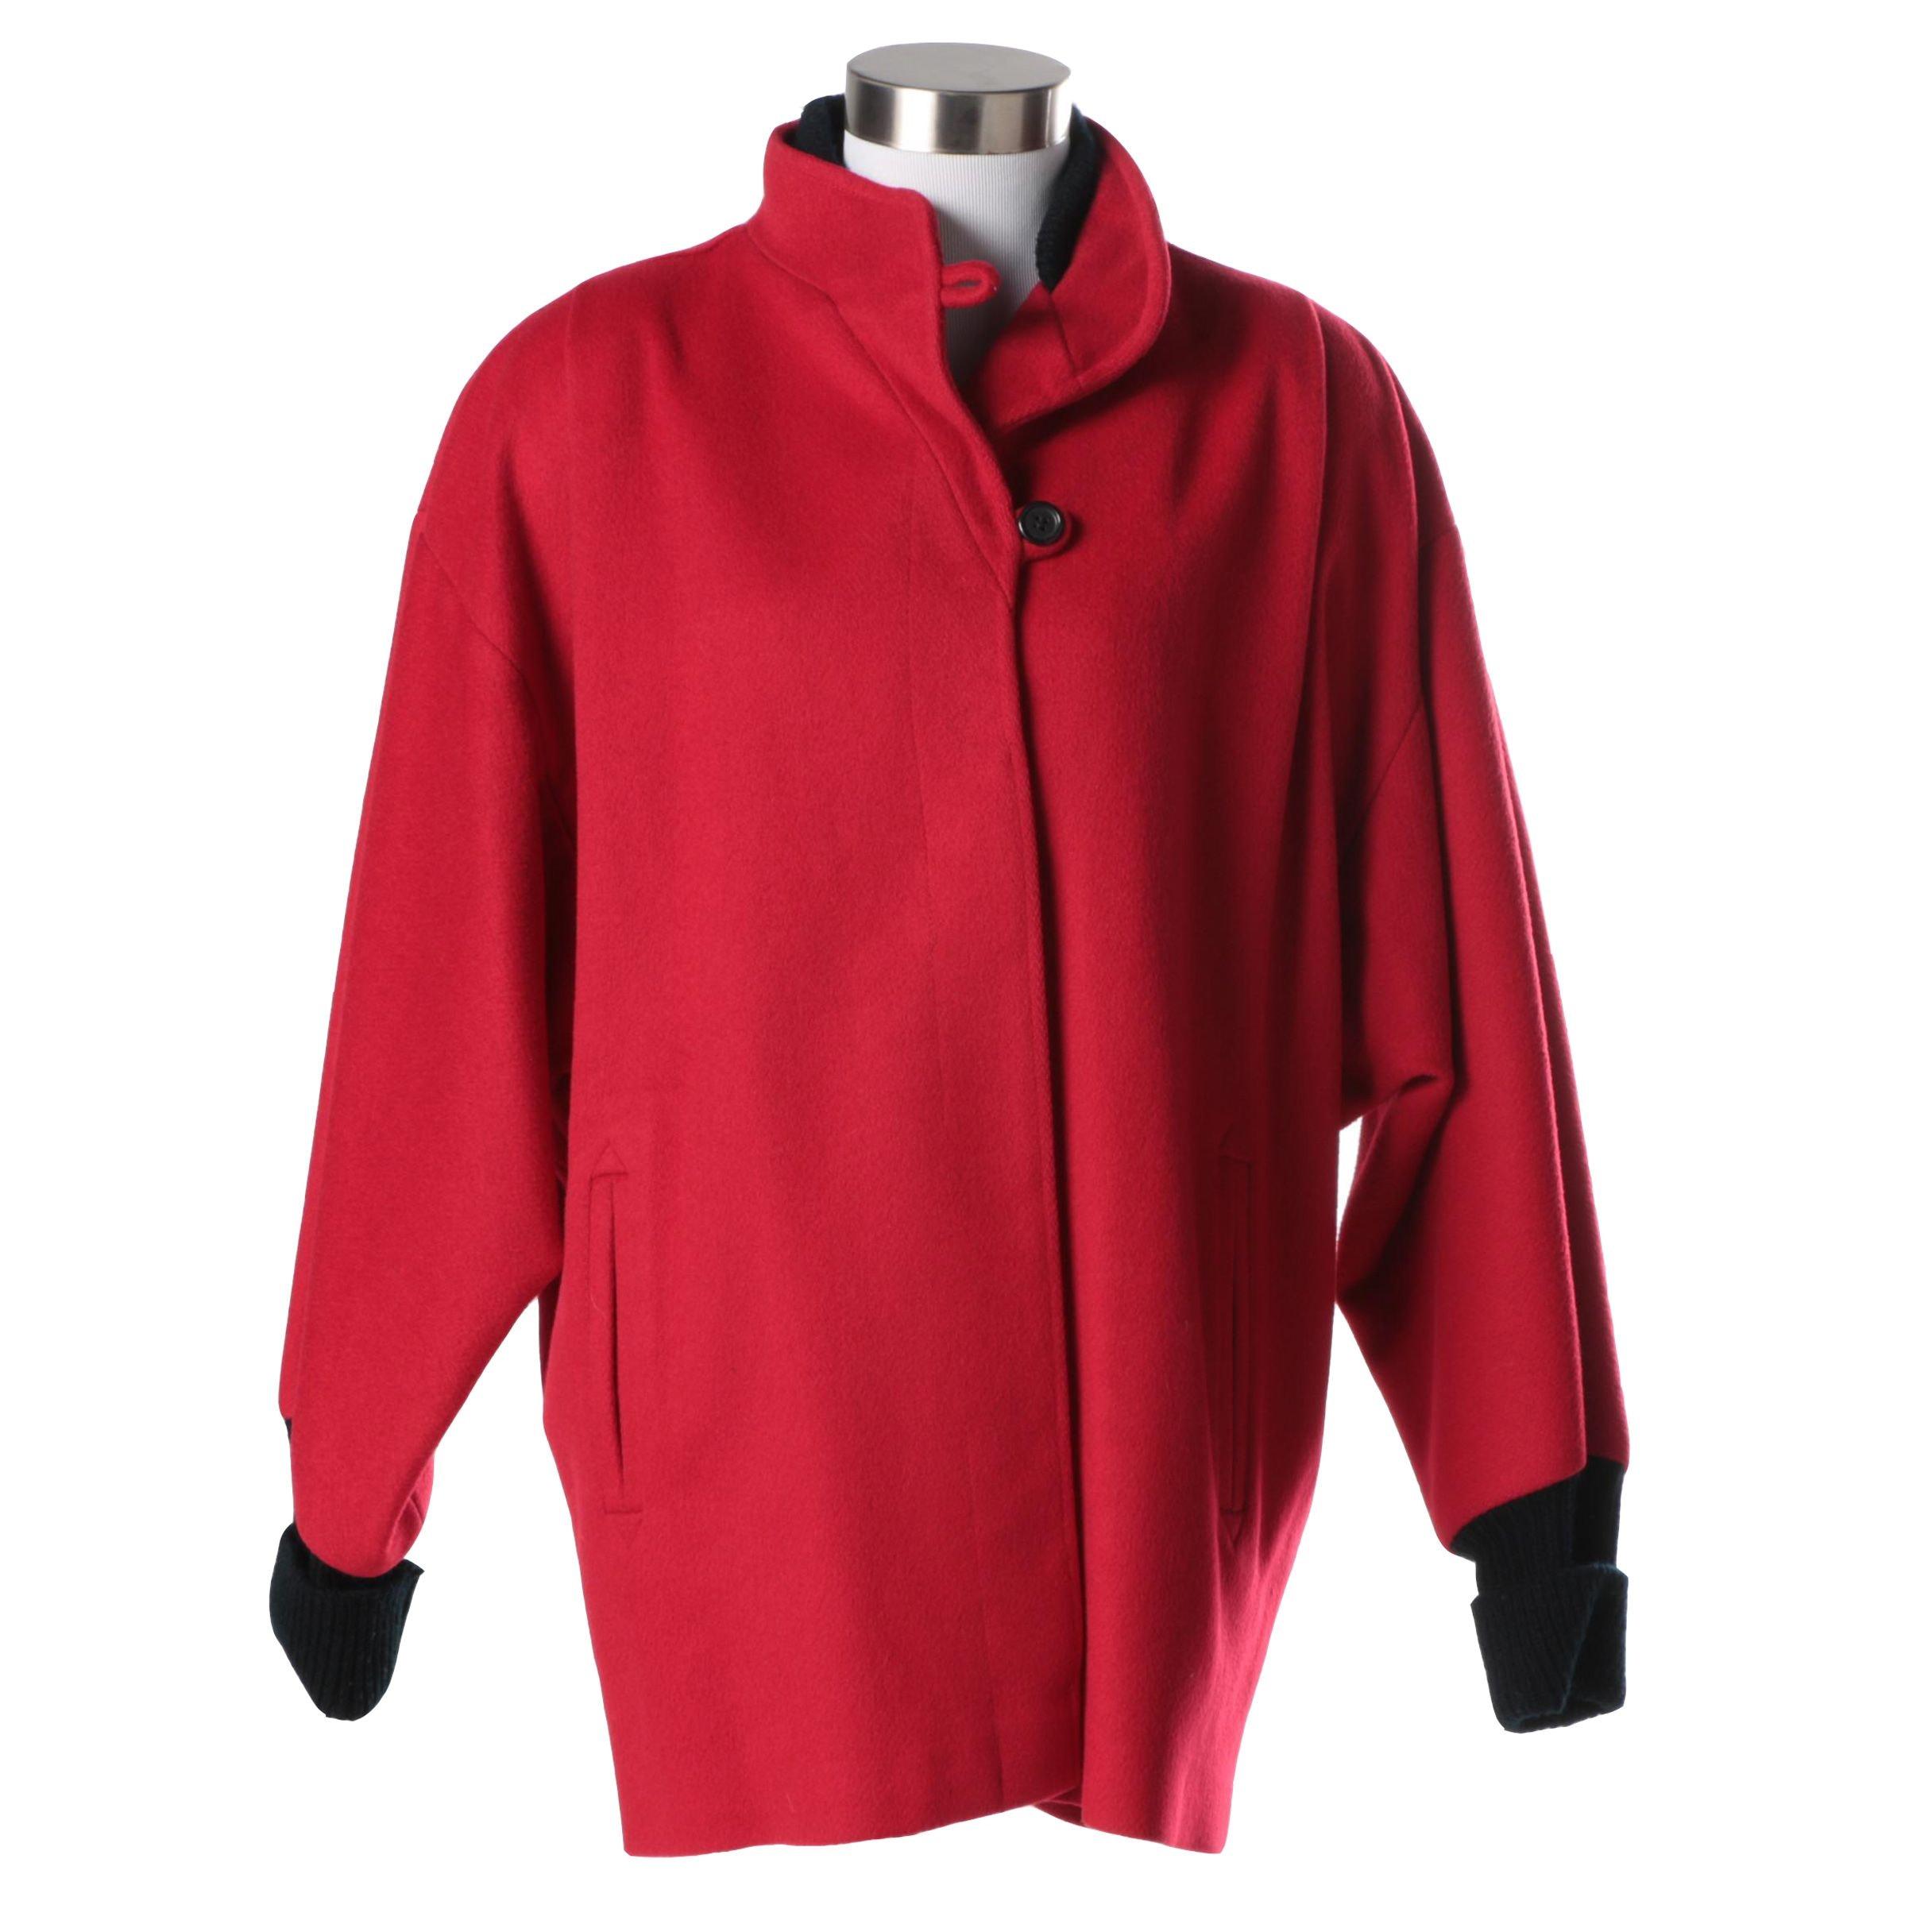 Women's Vintage Oversized Red Coat